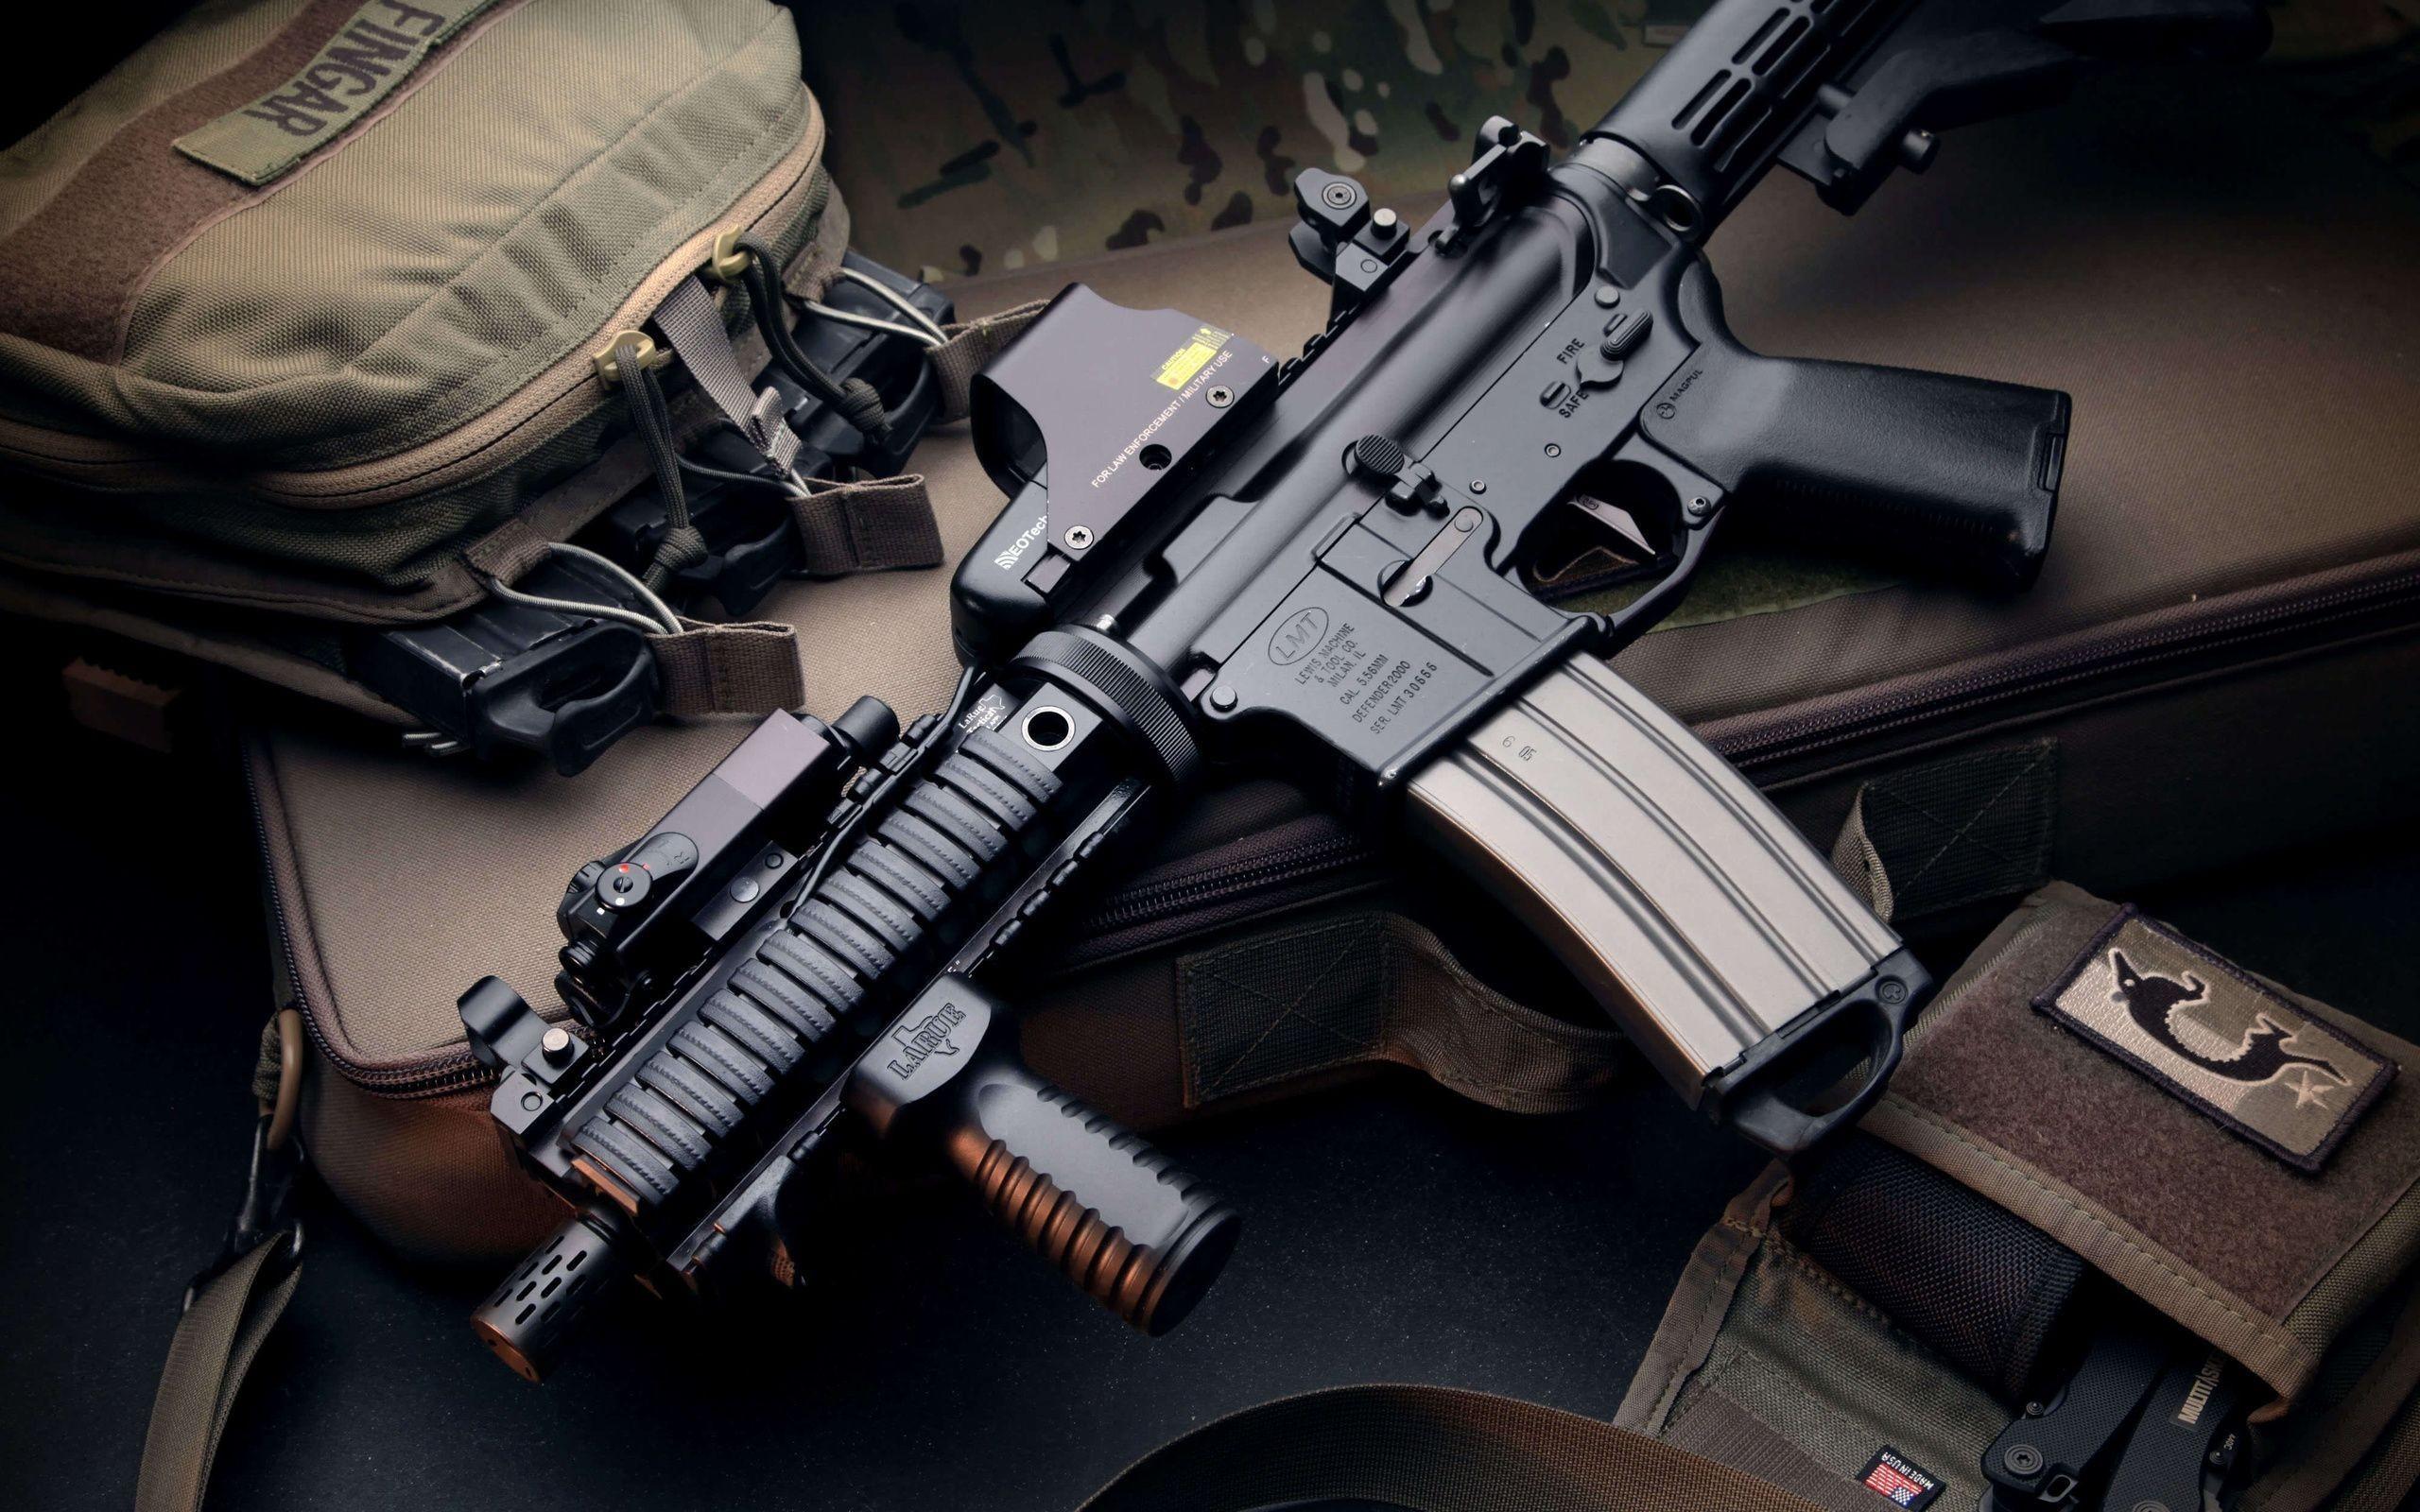 Weapon bag magpul collimator m4 machine gun military police .